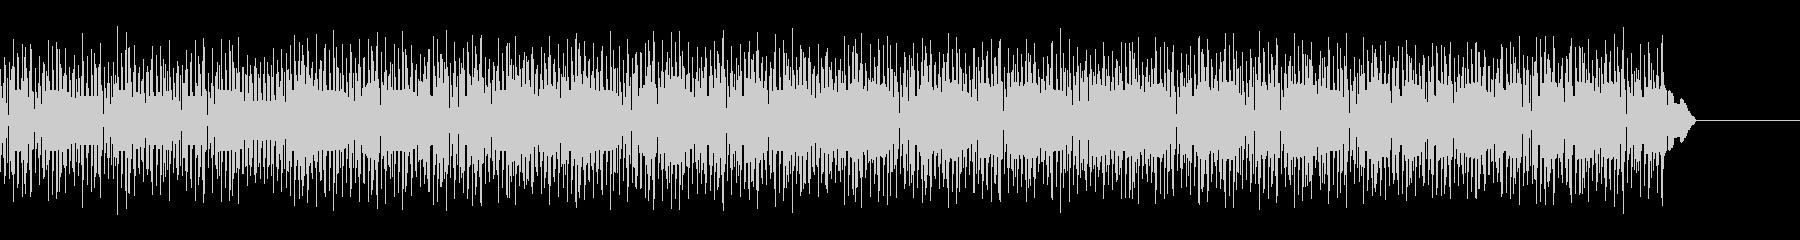 8bitピコピコサウンドで軽快なブルースの未再生の波形